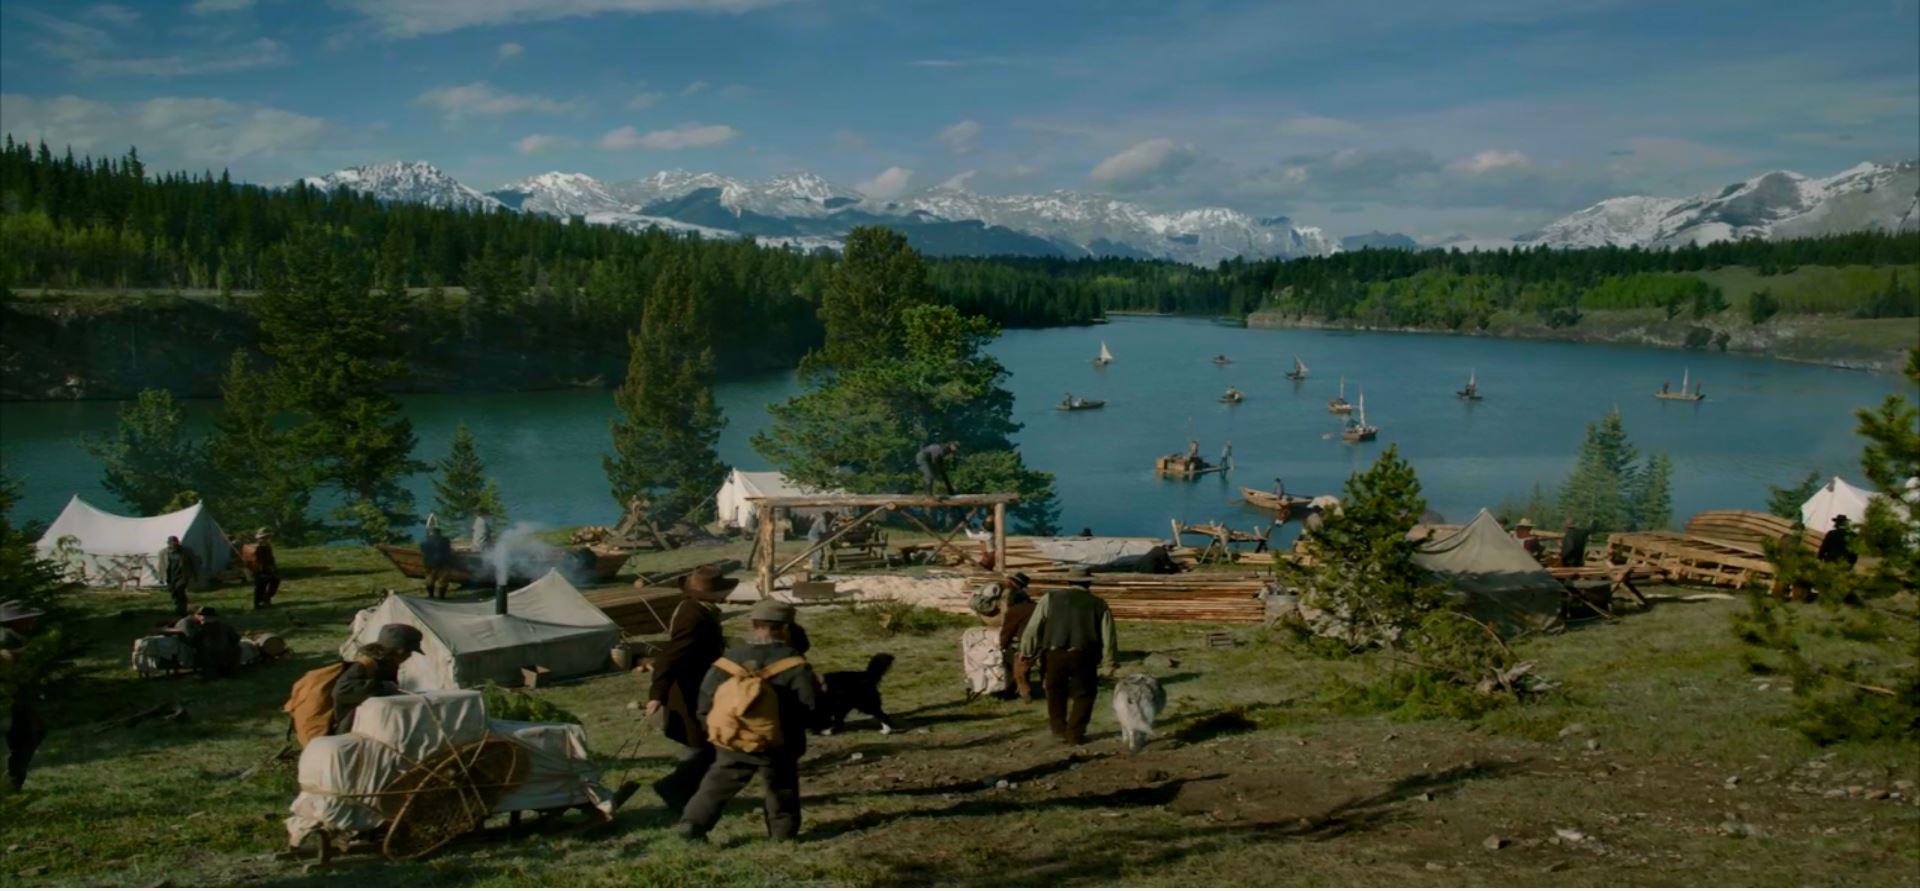 Klondike Fiebre del Oro Canada Alaska 03 - Be There Before